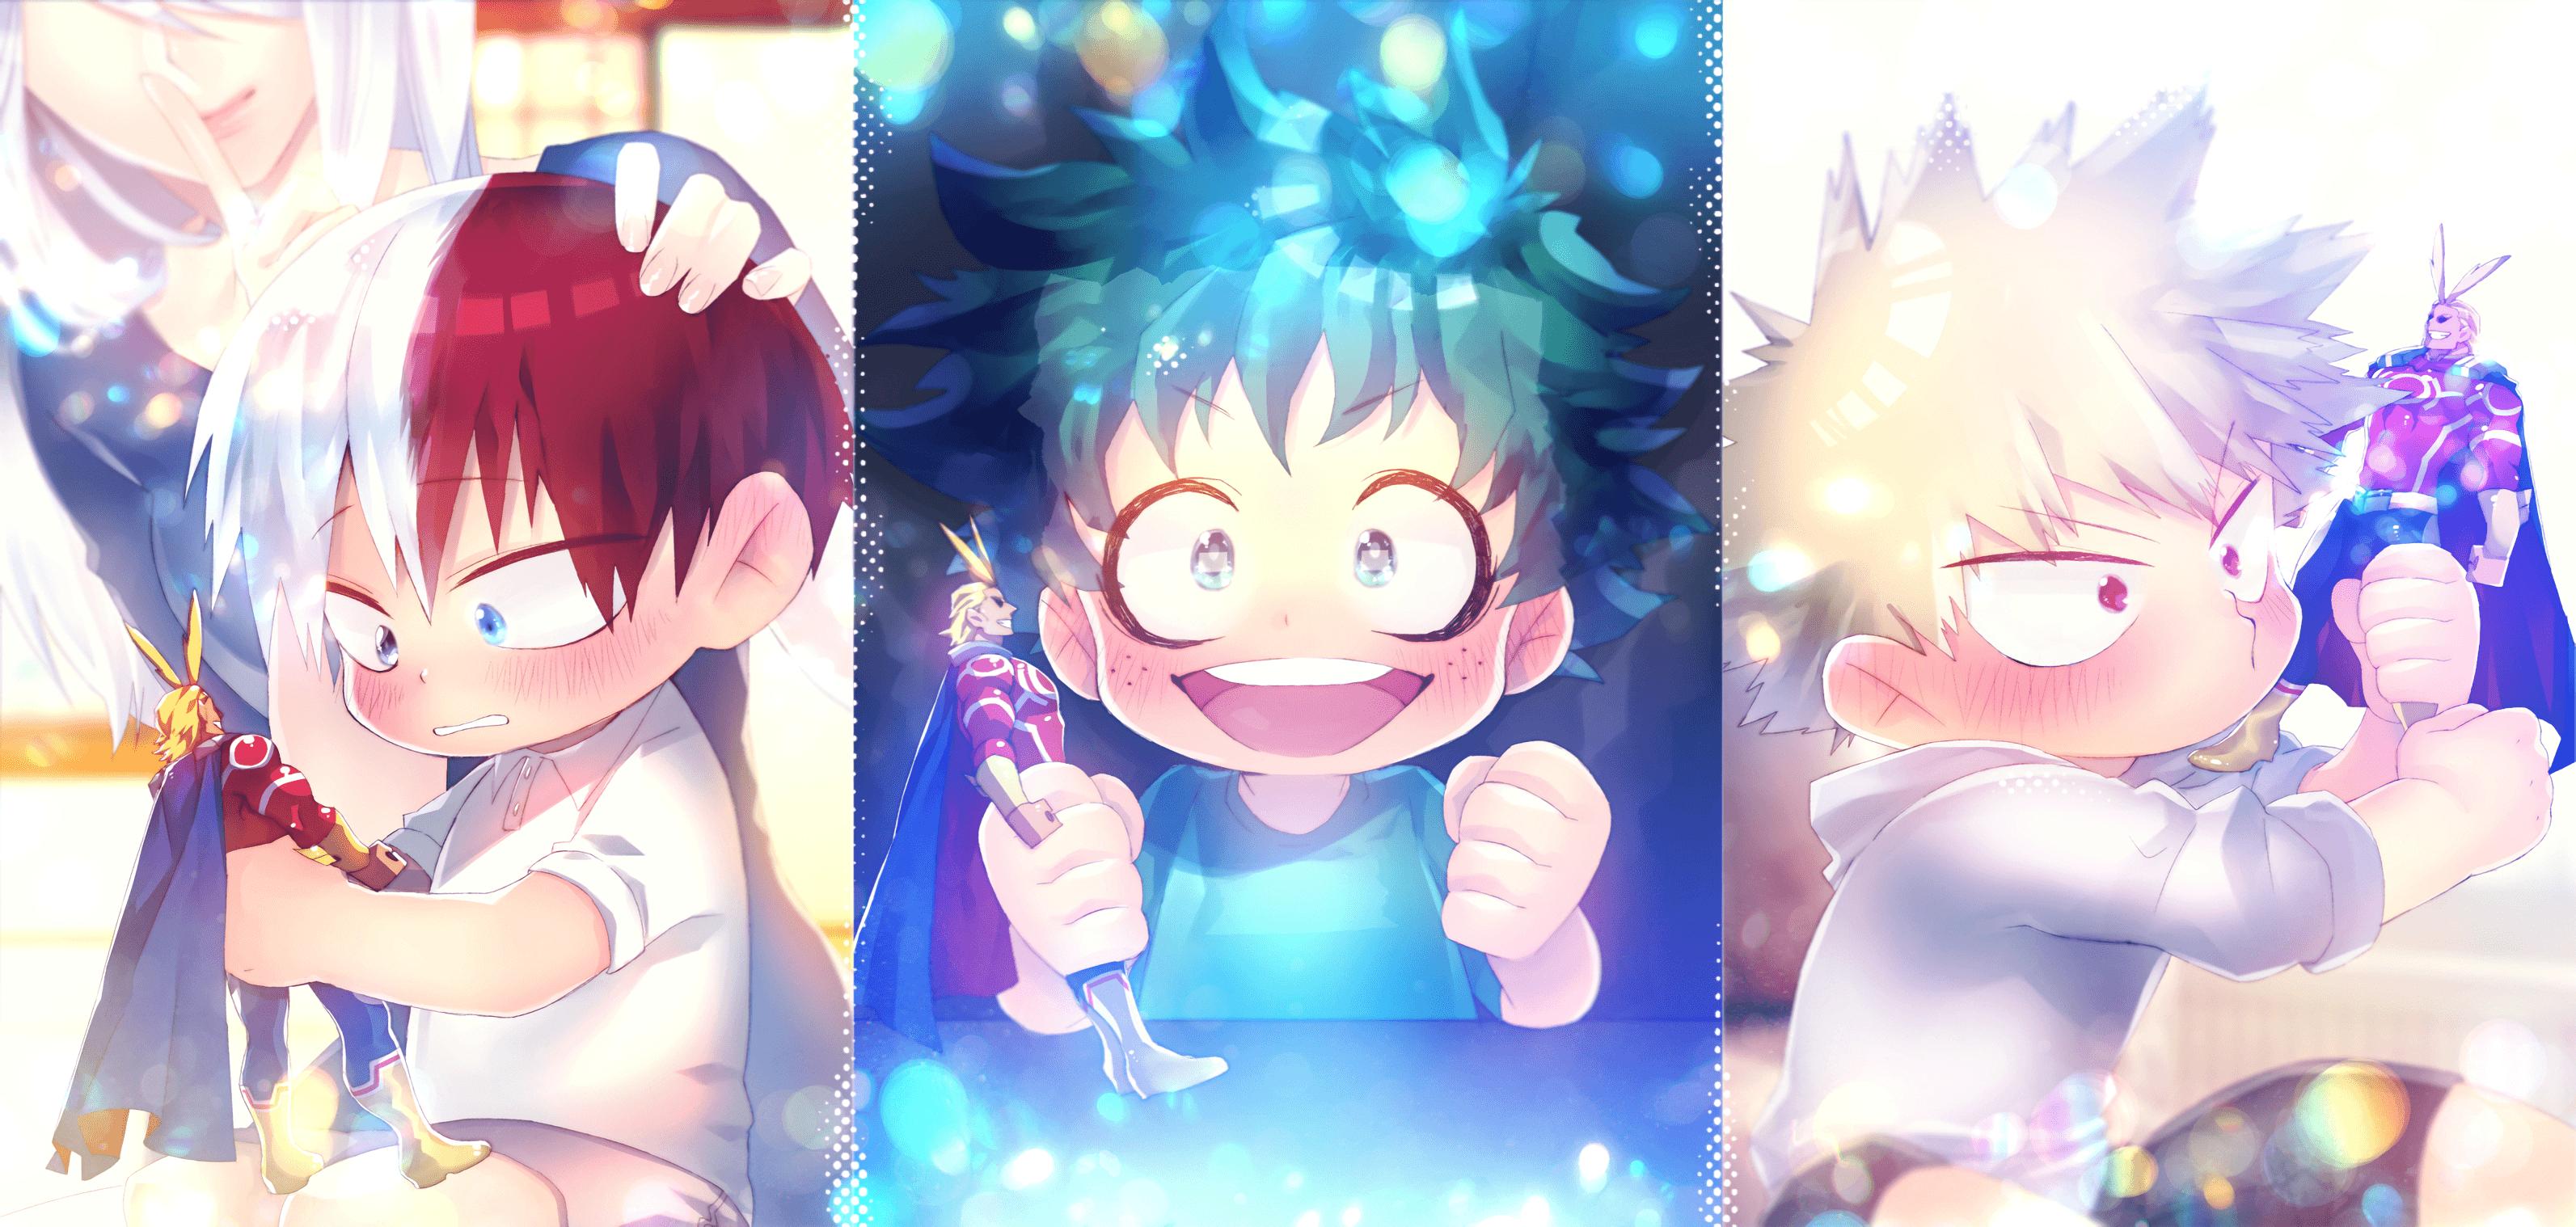 My Hero Academia Todoroki Wallpapers Top Free My Hero